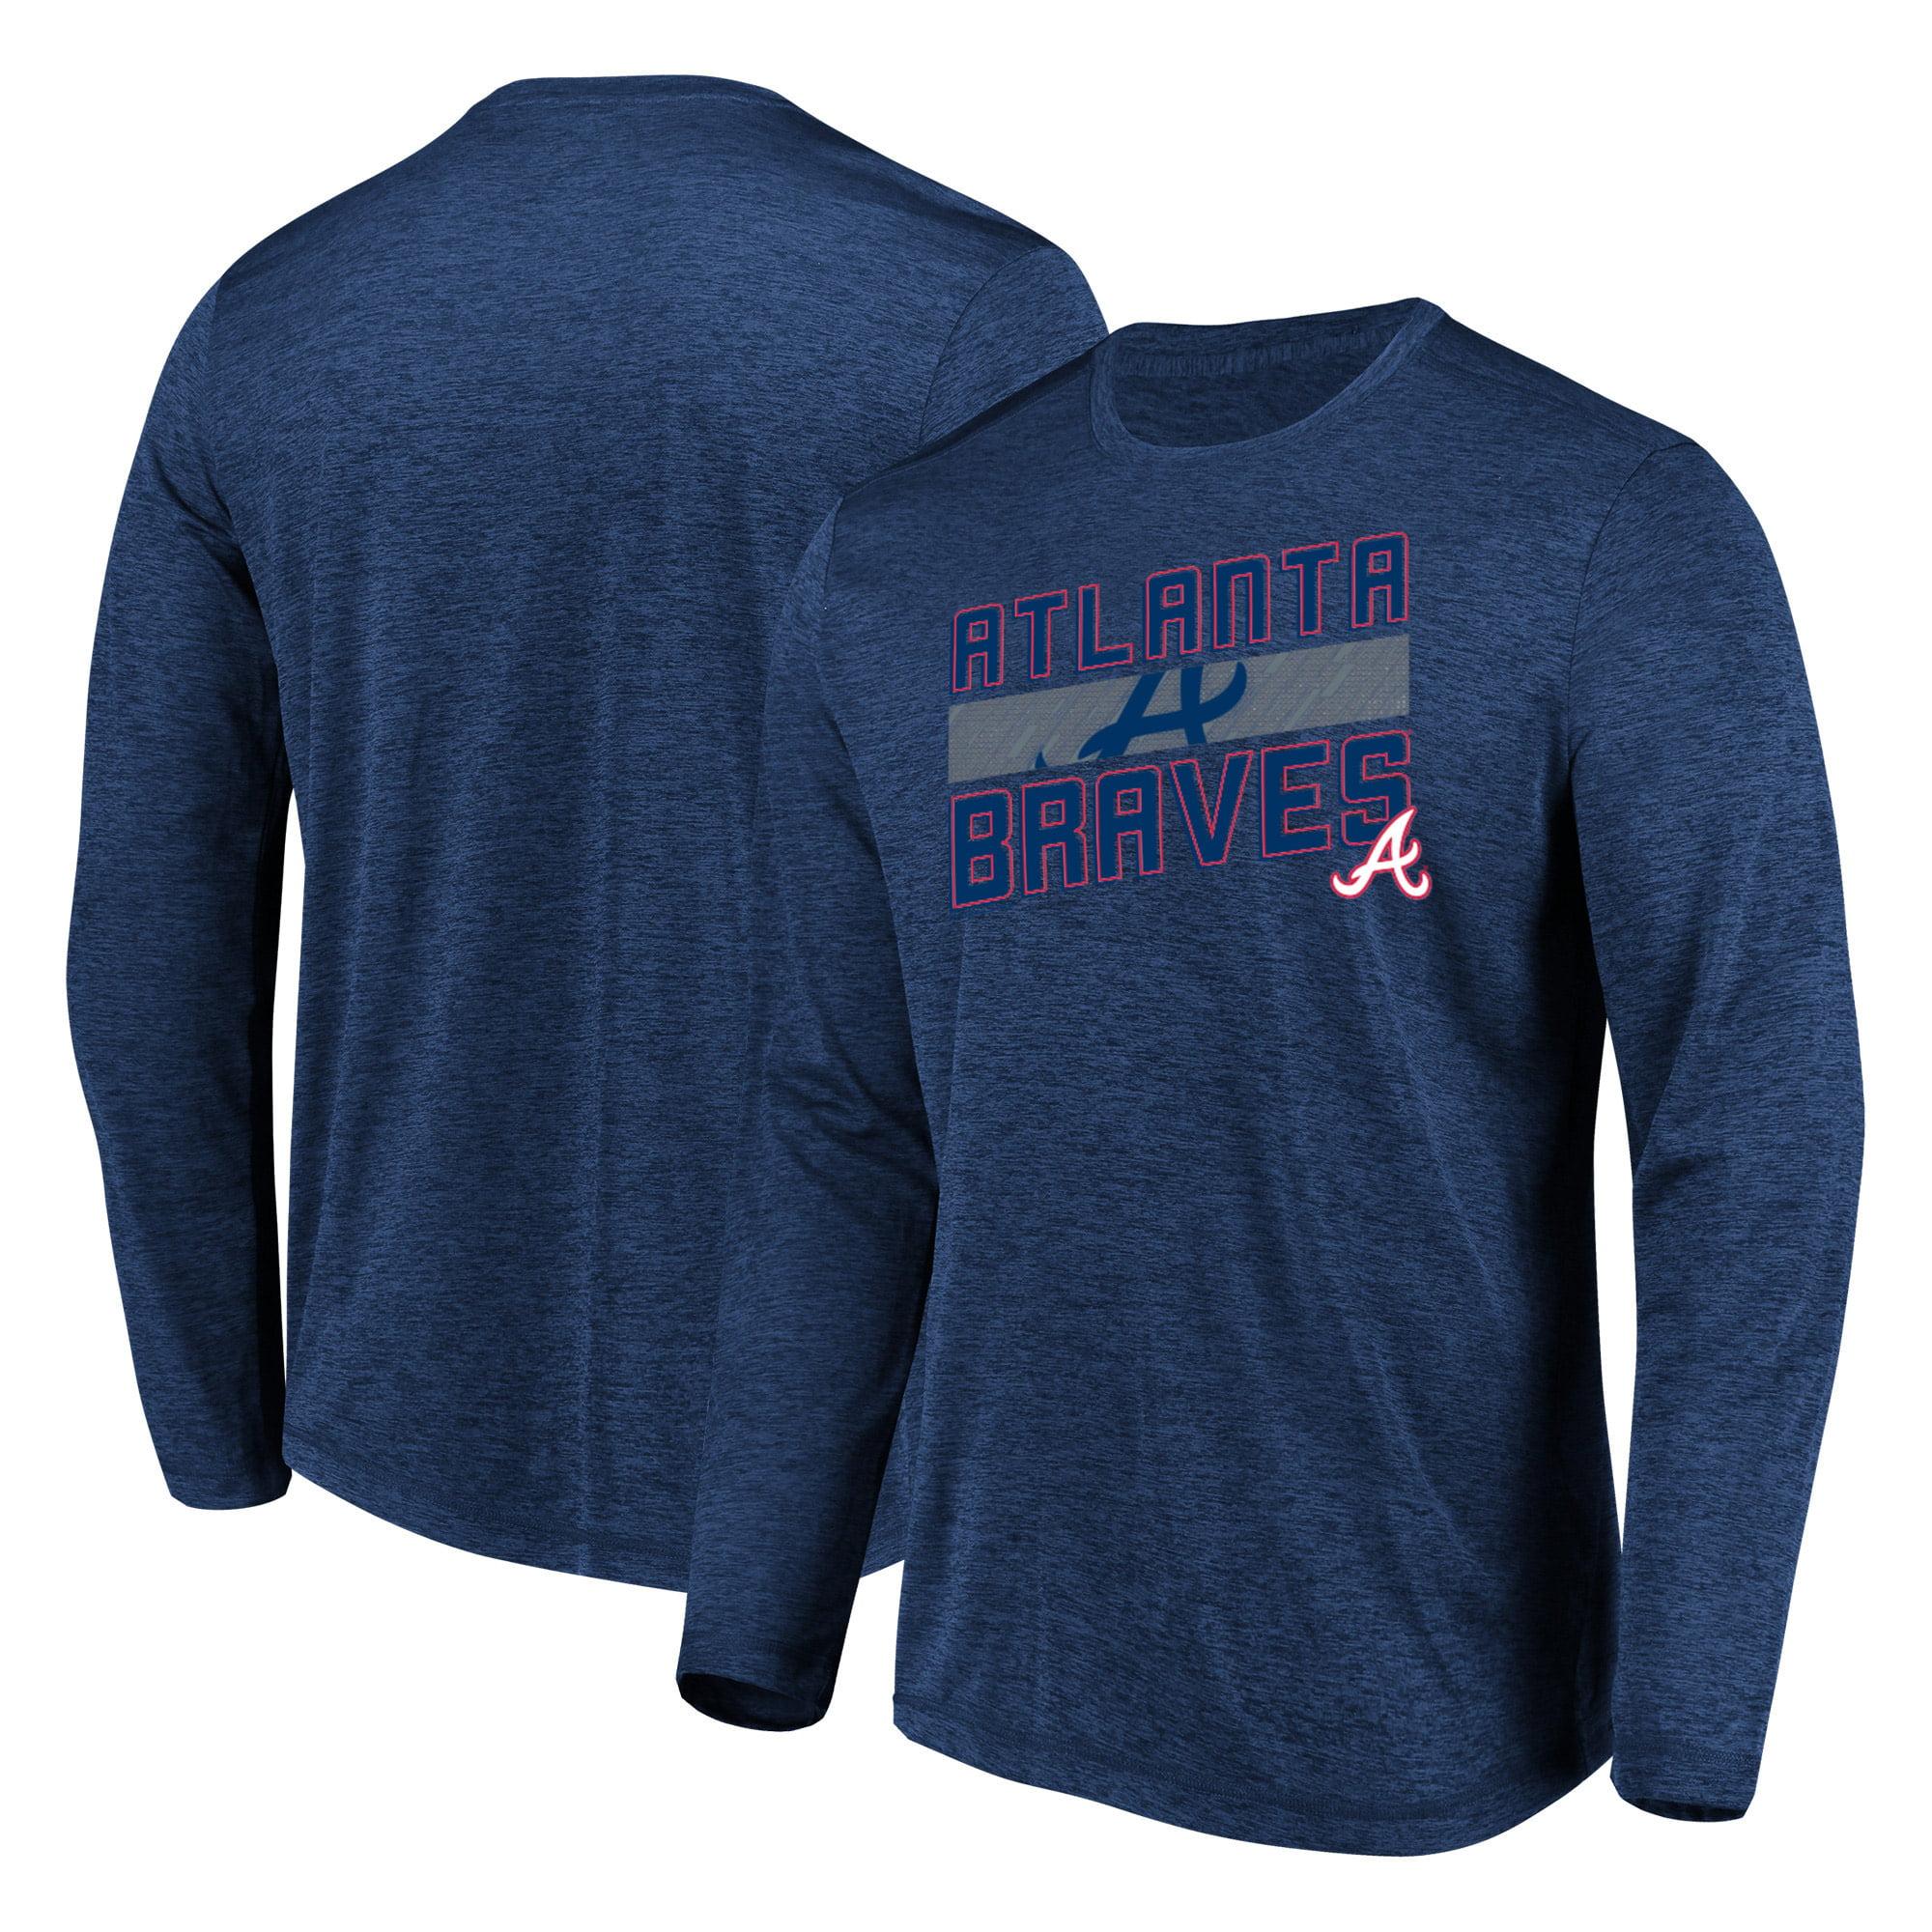 Men's Majestic Heathered Navy Atlanta Braves Big & Tall Long Sleeve Team T-Shirt